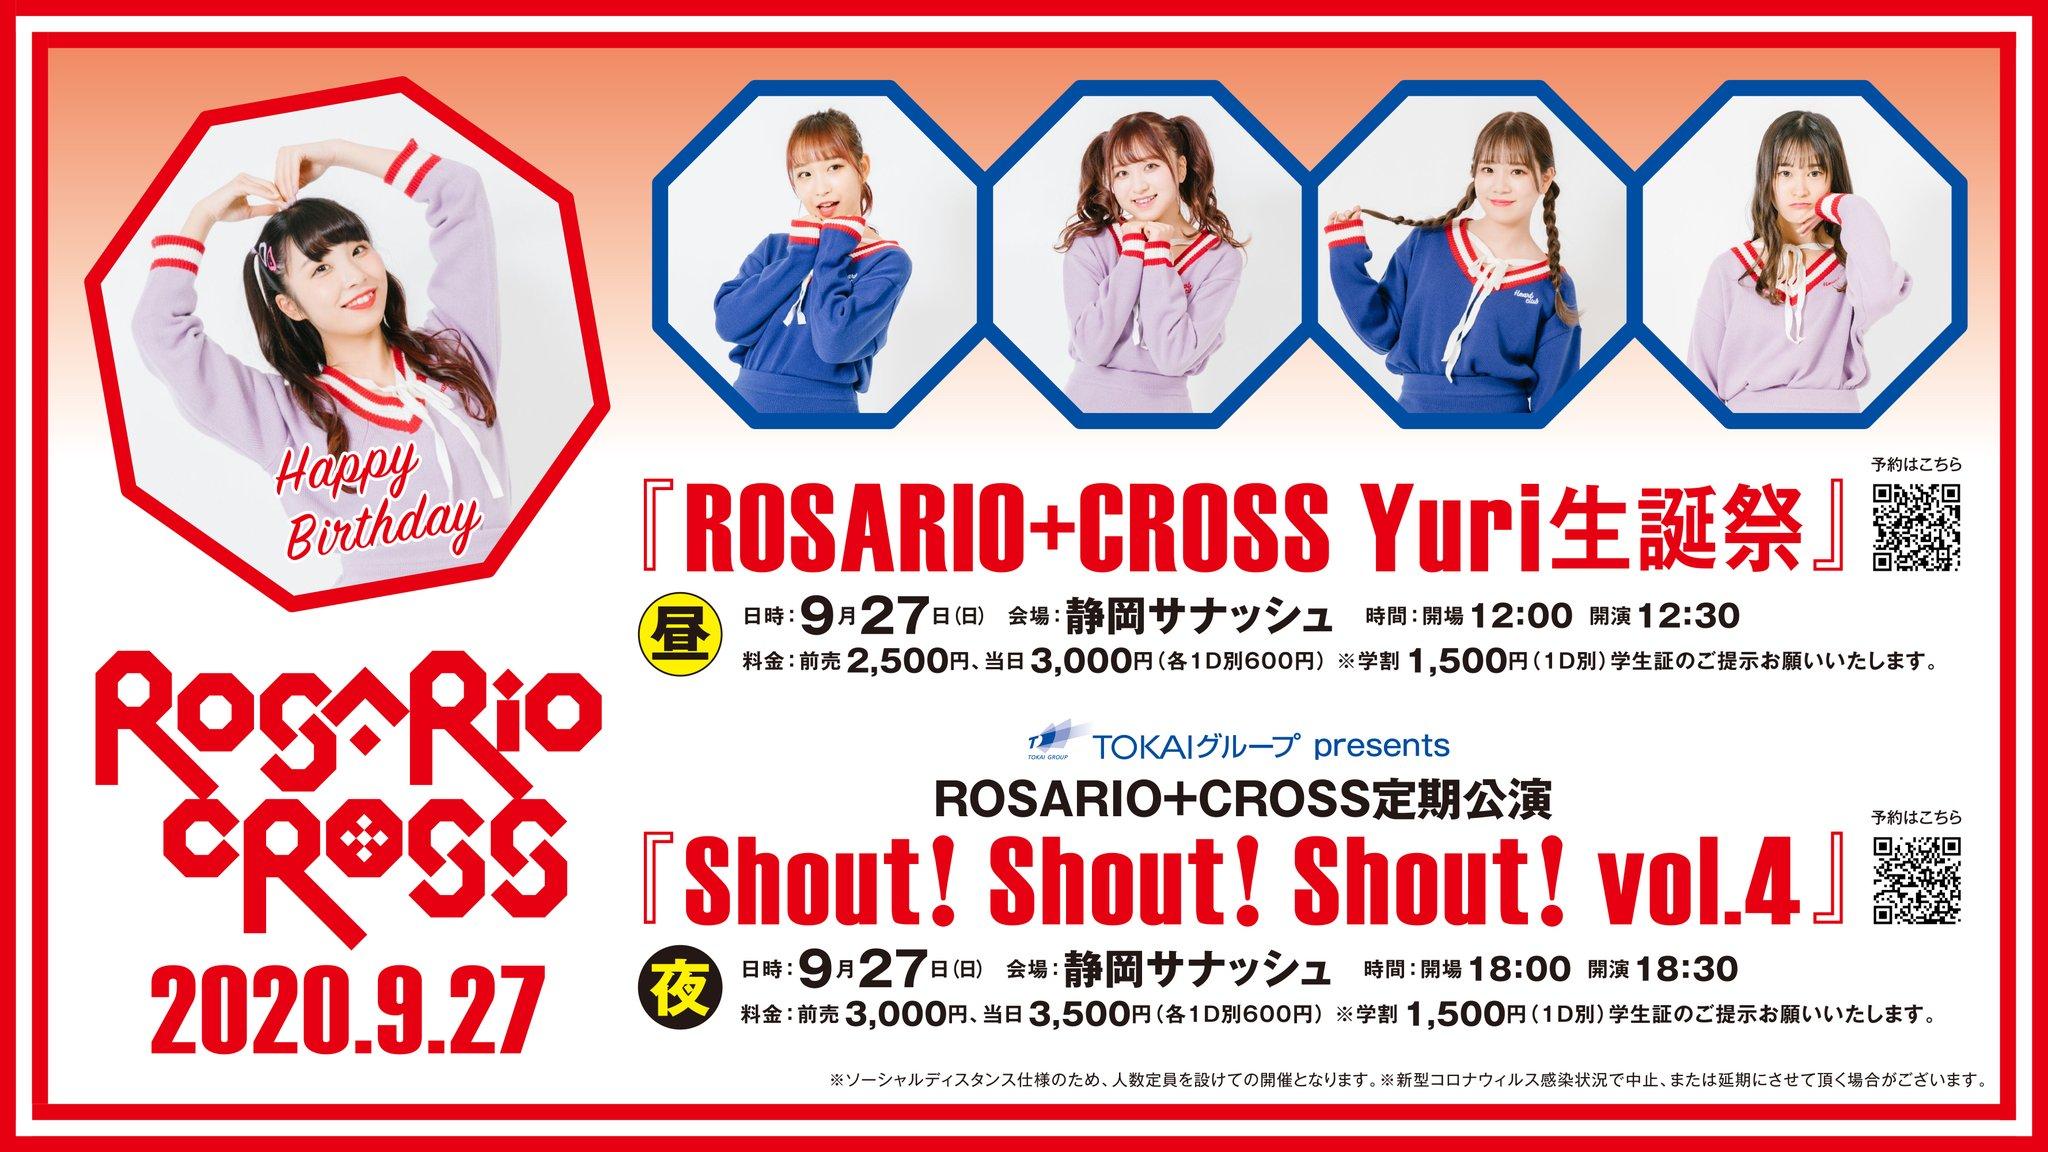 【ROSARIO+CROSS】夜公演 TOKAI Presents「Shout! Shout! Shout! vol.4」